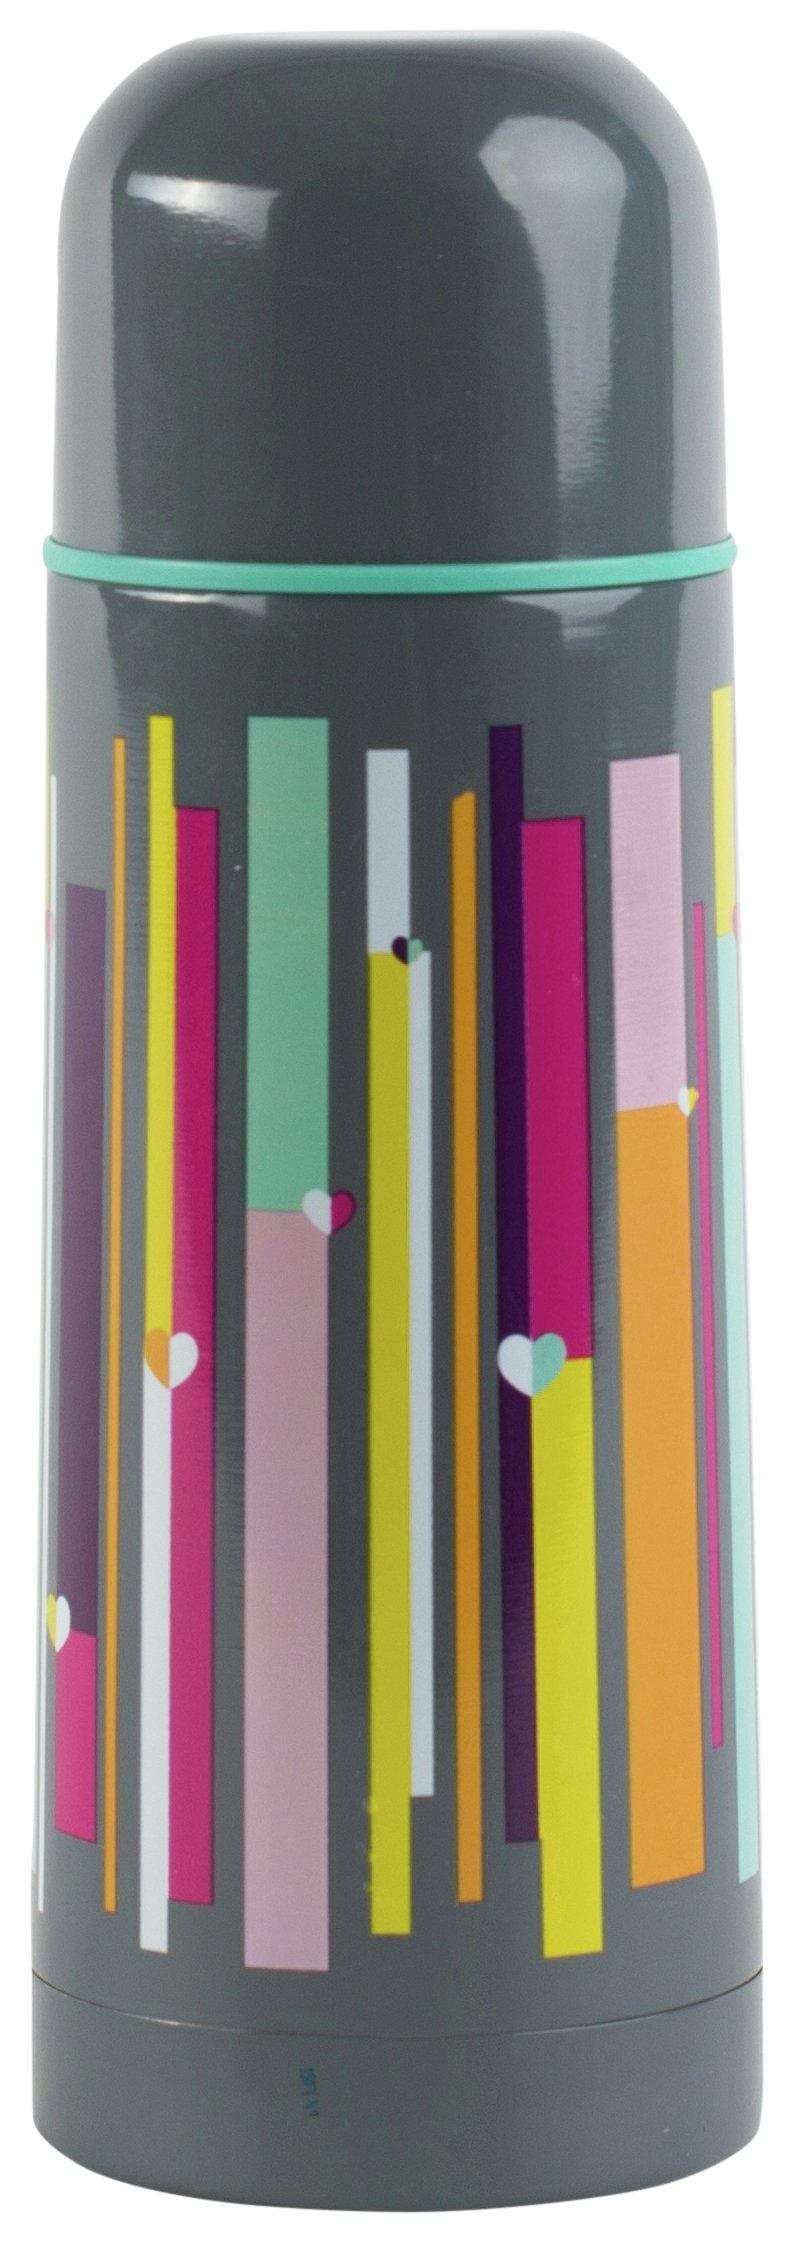 Image of Beau and Elliot Linear Vacuum Flask - 350ml